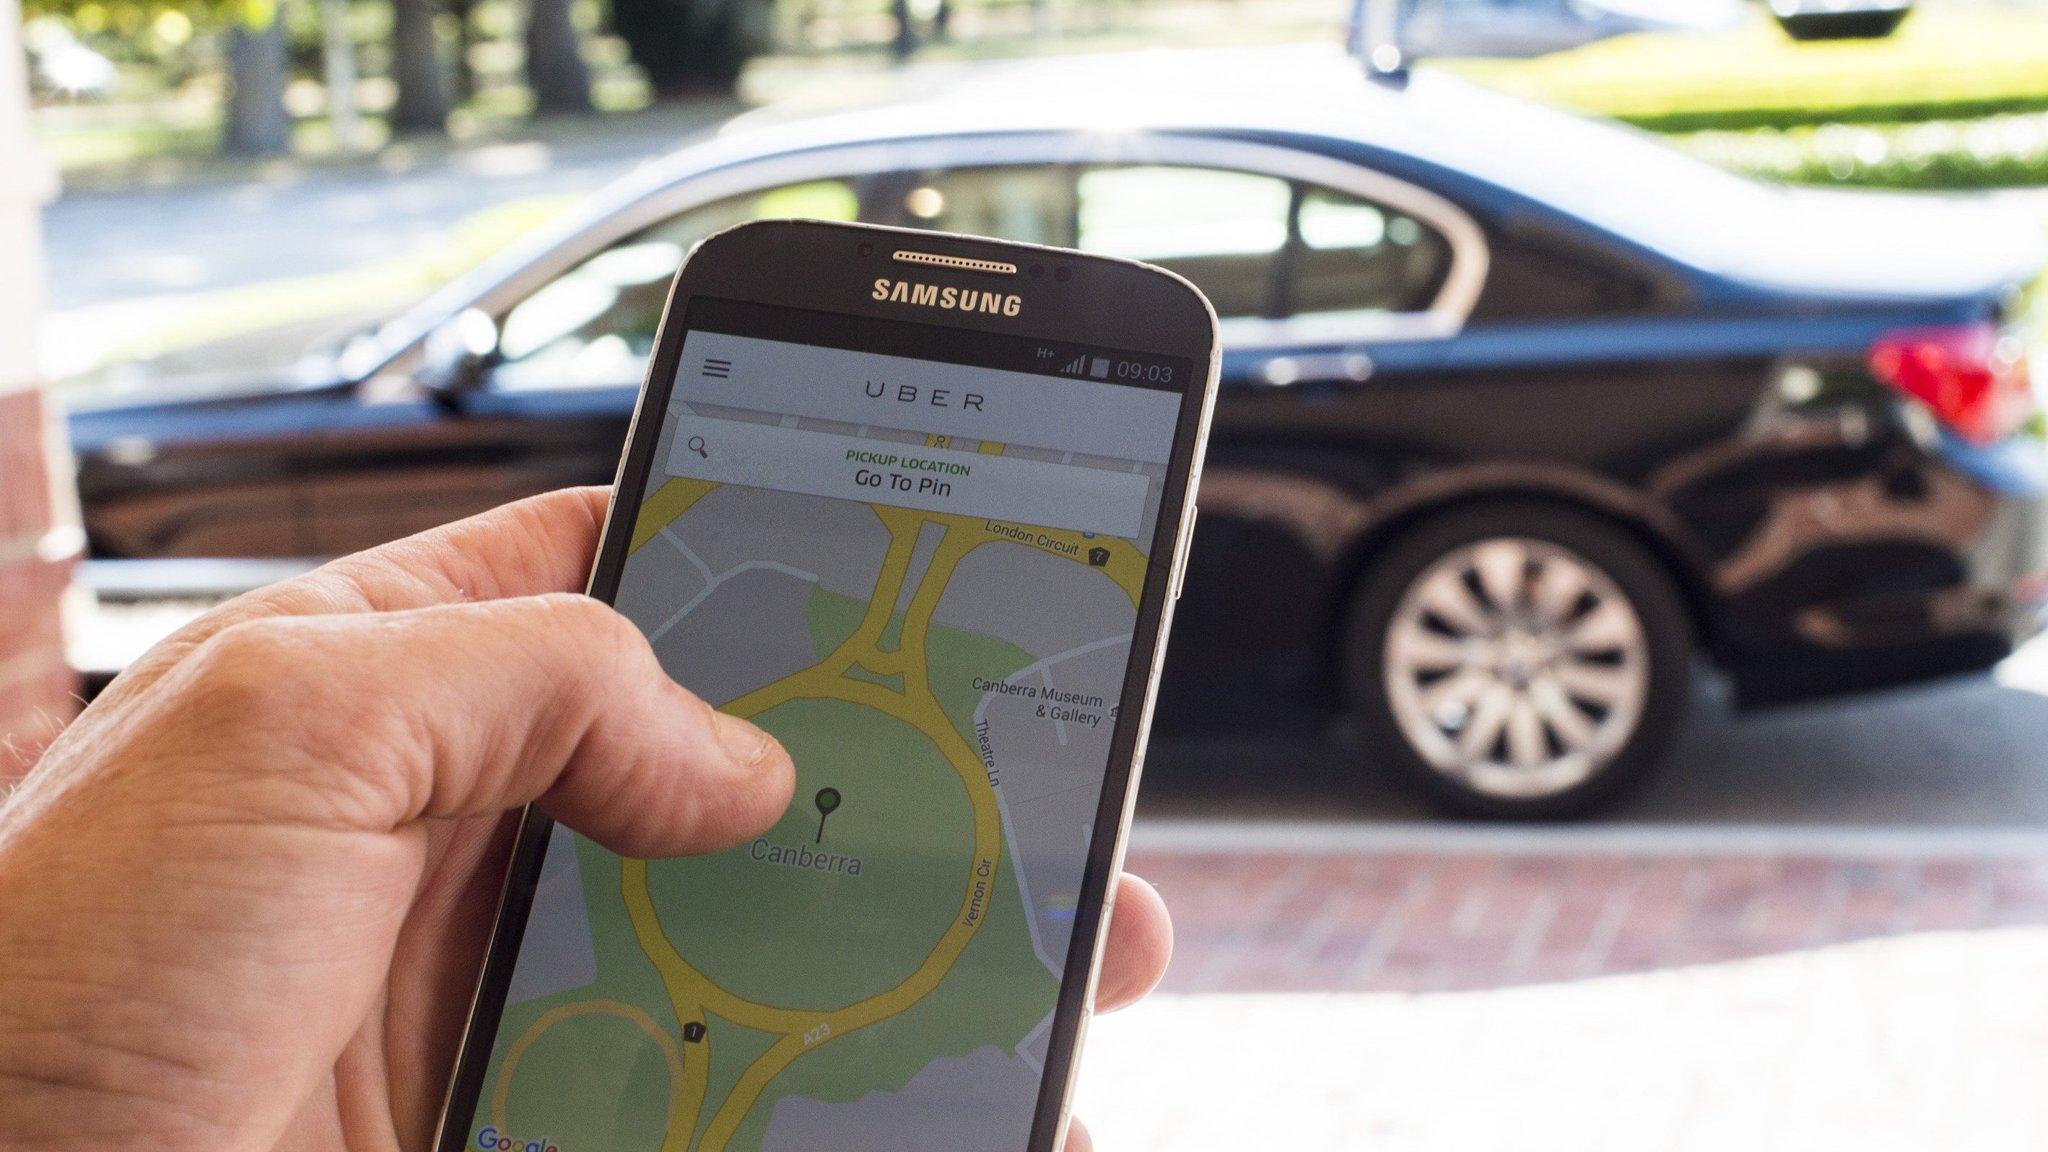 Australia's Uber drivers earn less than minimum wage